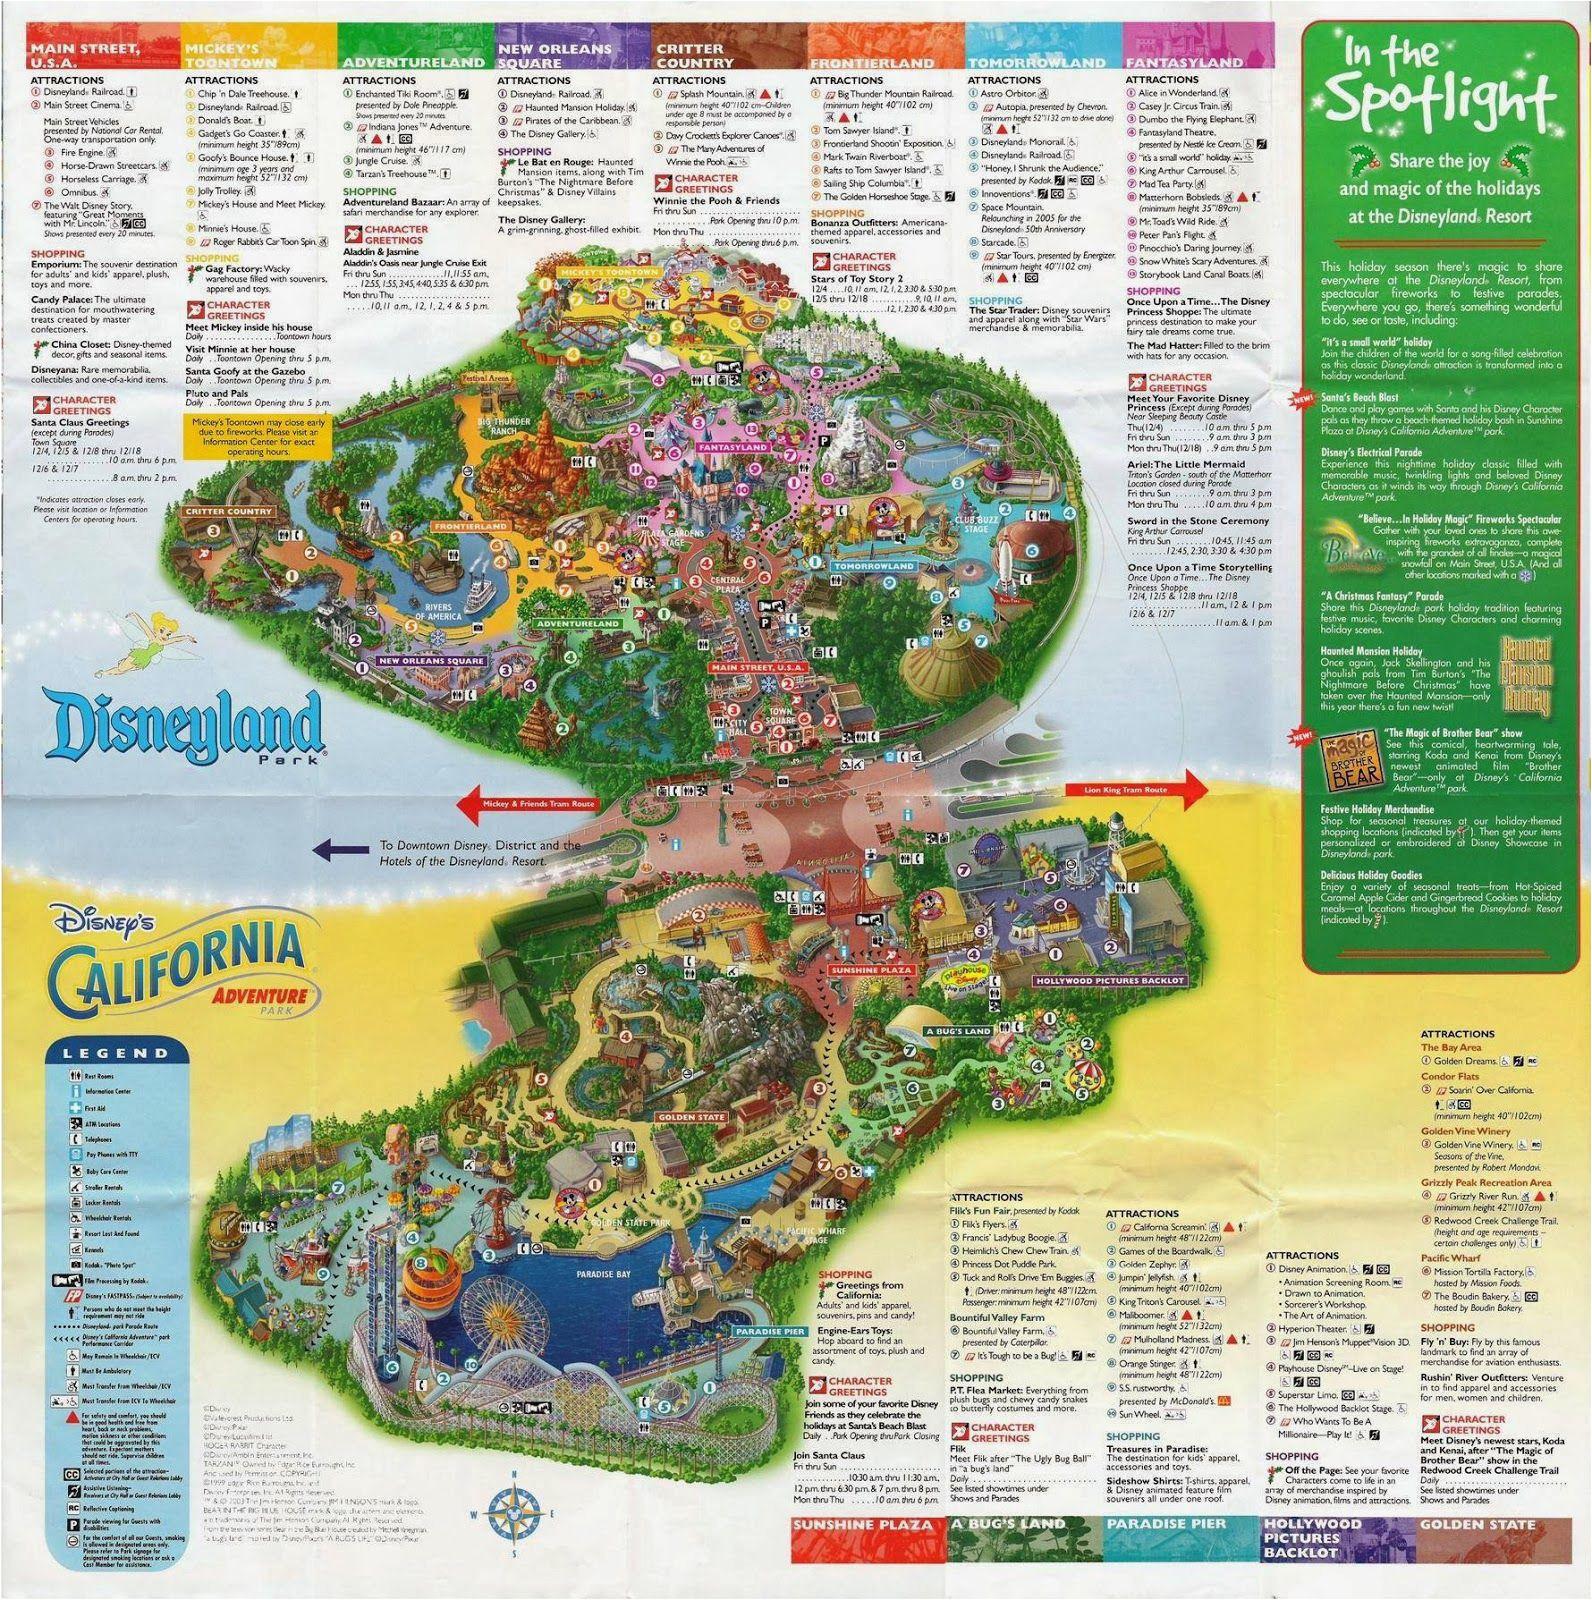 Map Of Disneyland and California Adventure Park | secretmuseum